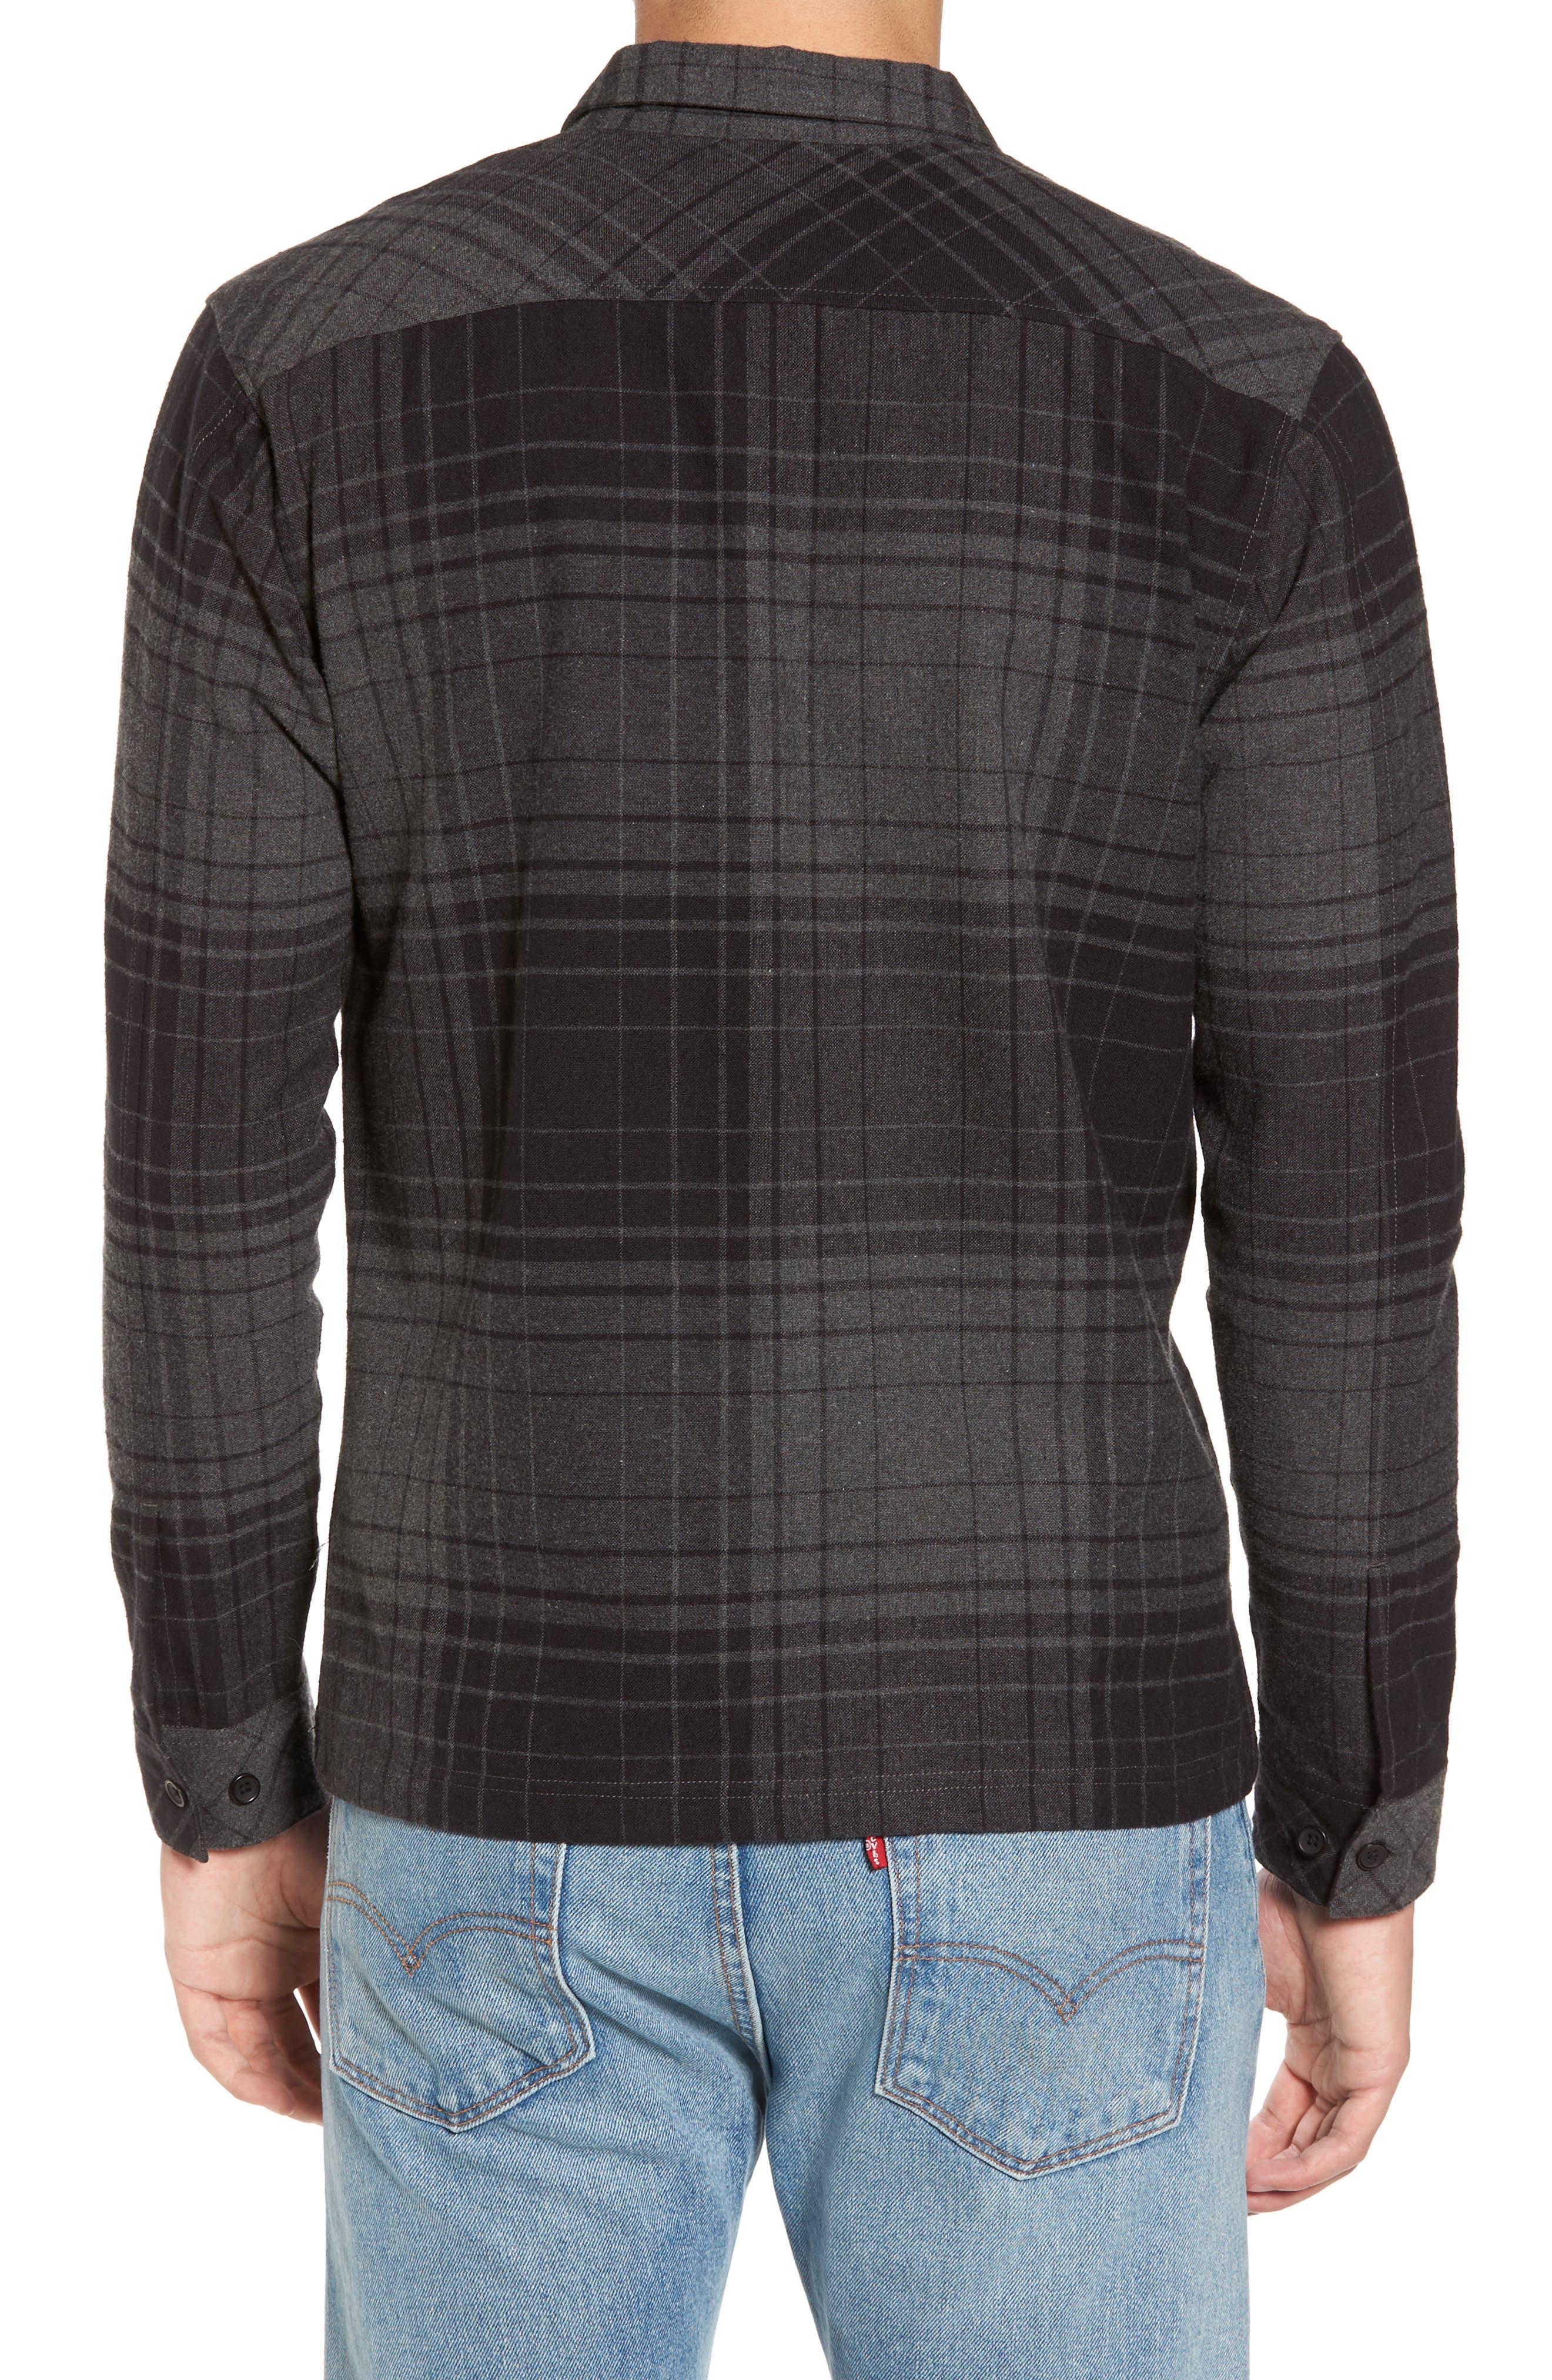 Lamar Shirt Jacket,                             Alternate thumbnail 2, color,                             Black